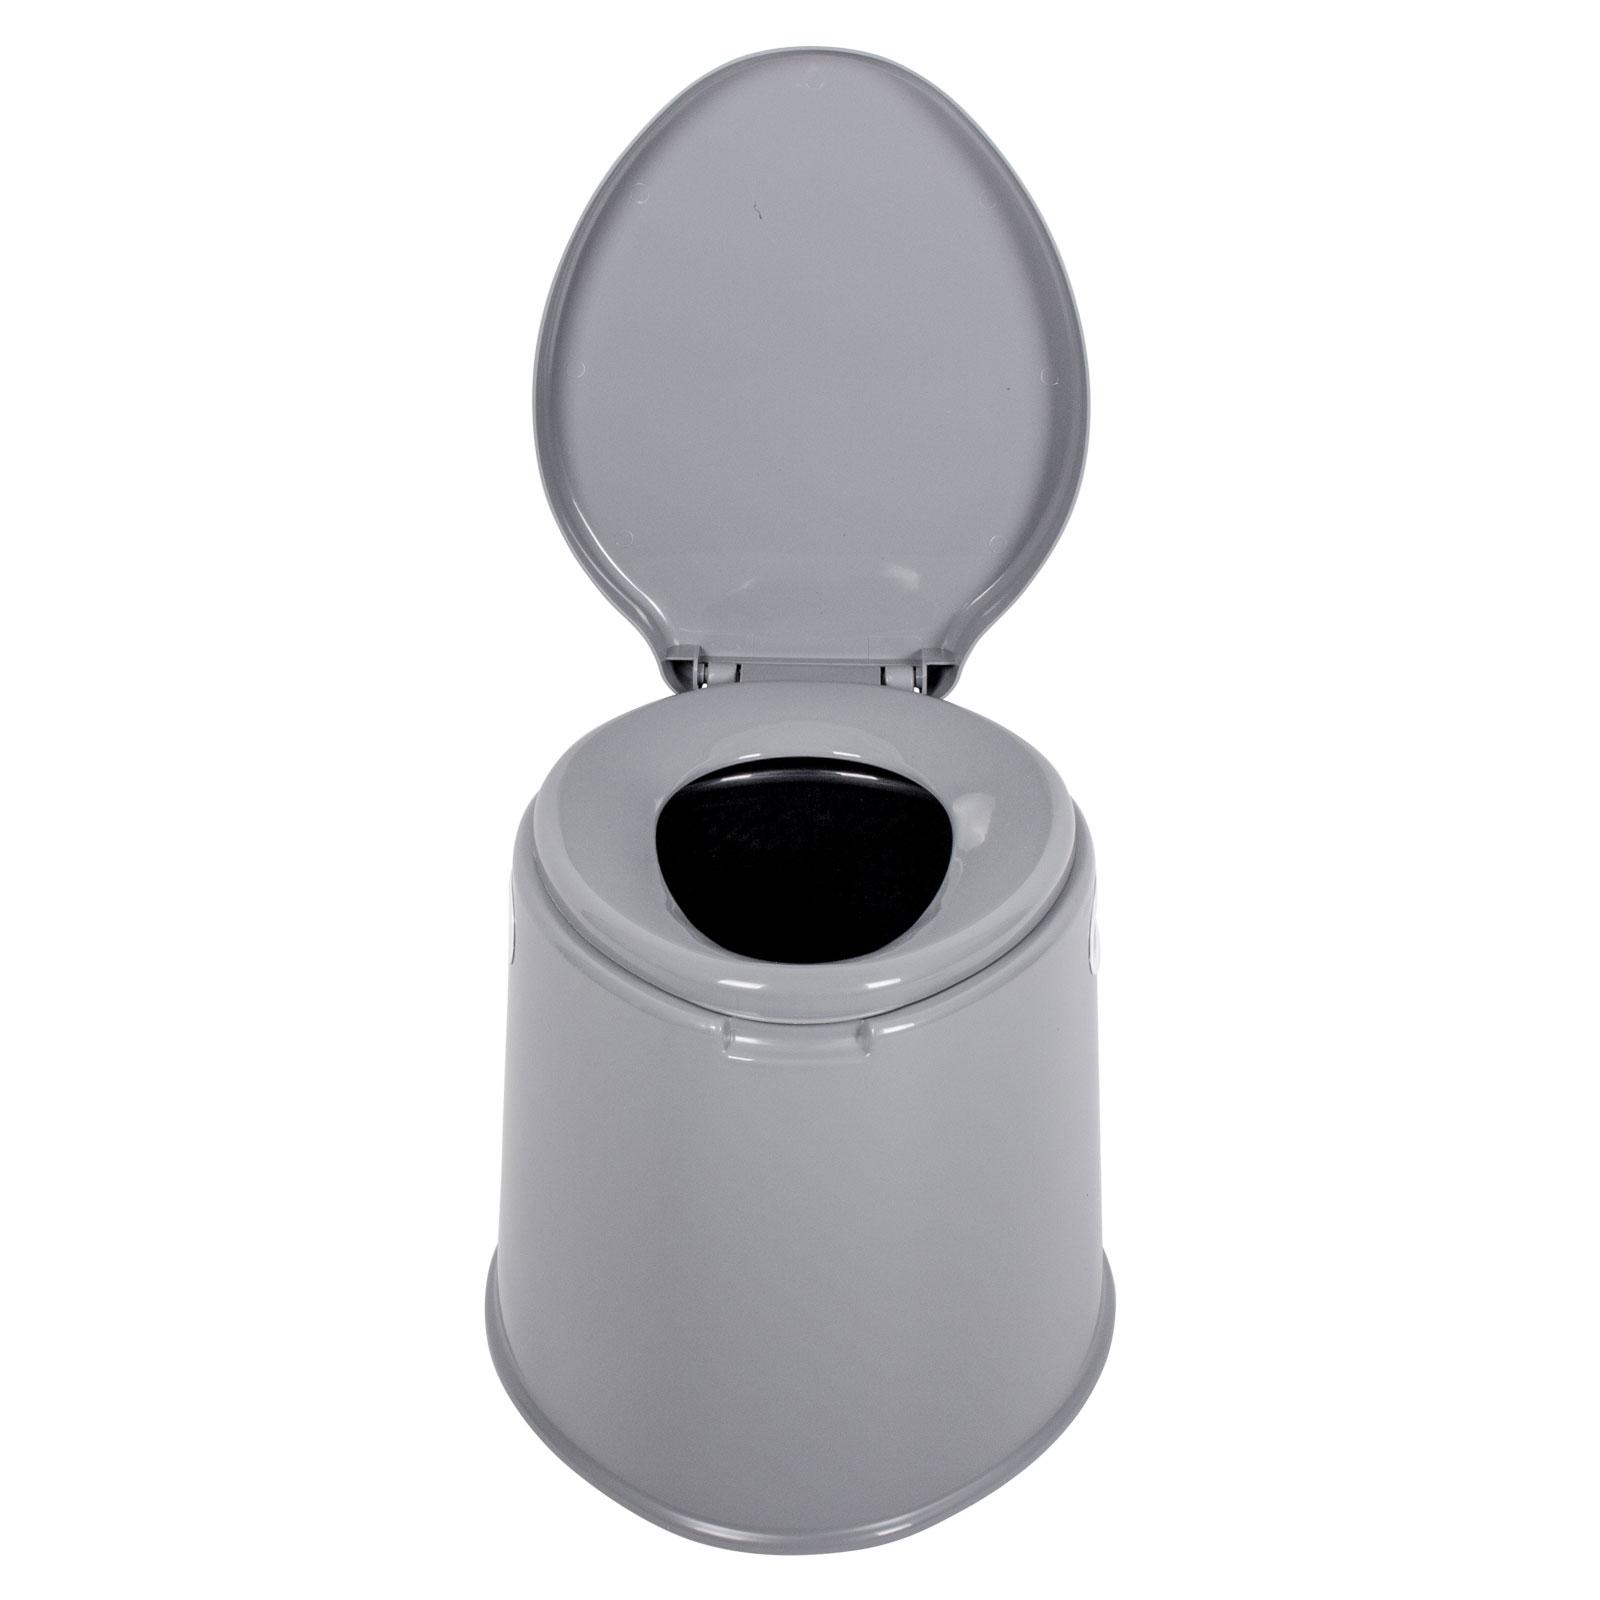 Proplus campingtoilette 7 liter volumen 40 5 x 49 x 33cm grau f r t4 t5 t6 ebay - Camping toilette fur gartenhaus ...